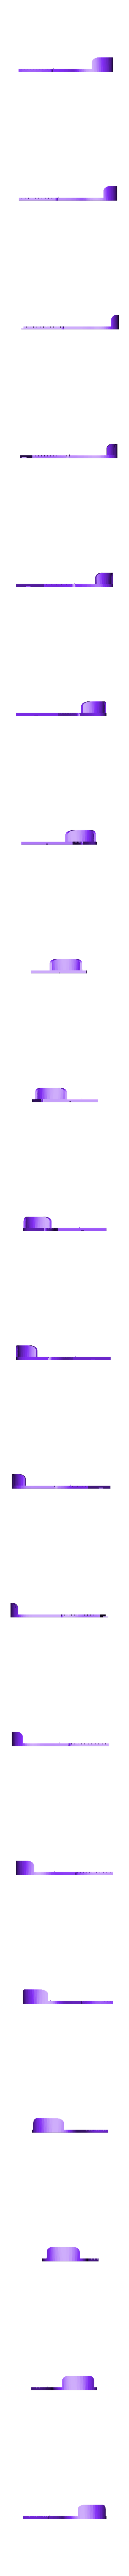 talon.STL Download free STL file pedimeter • Object to 3D print, Thomy